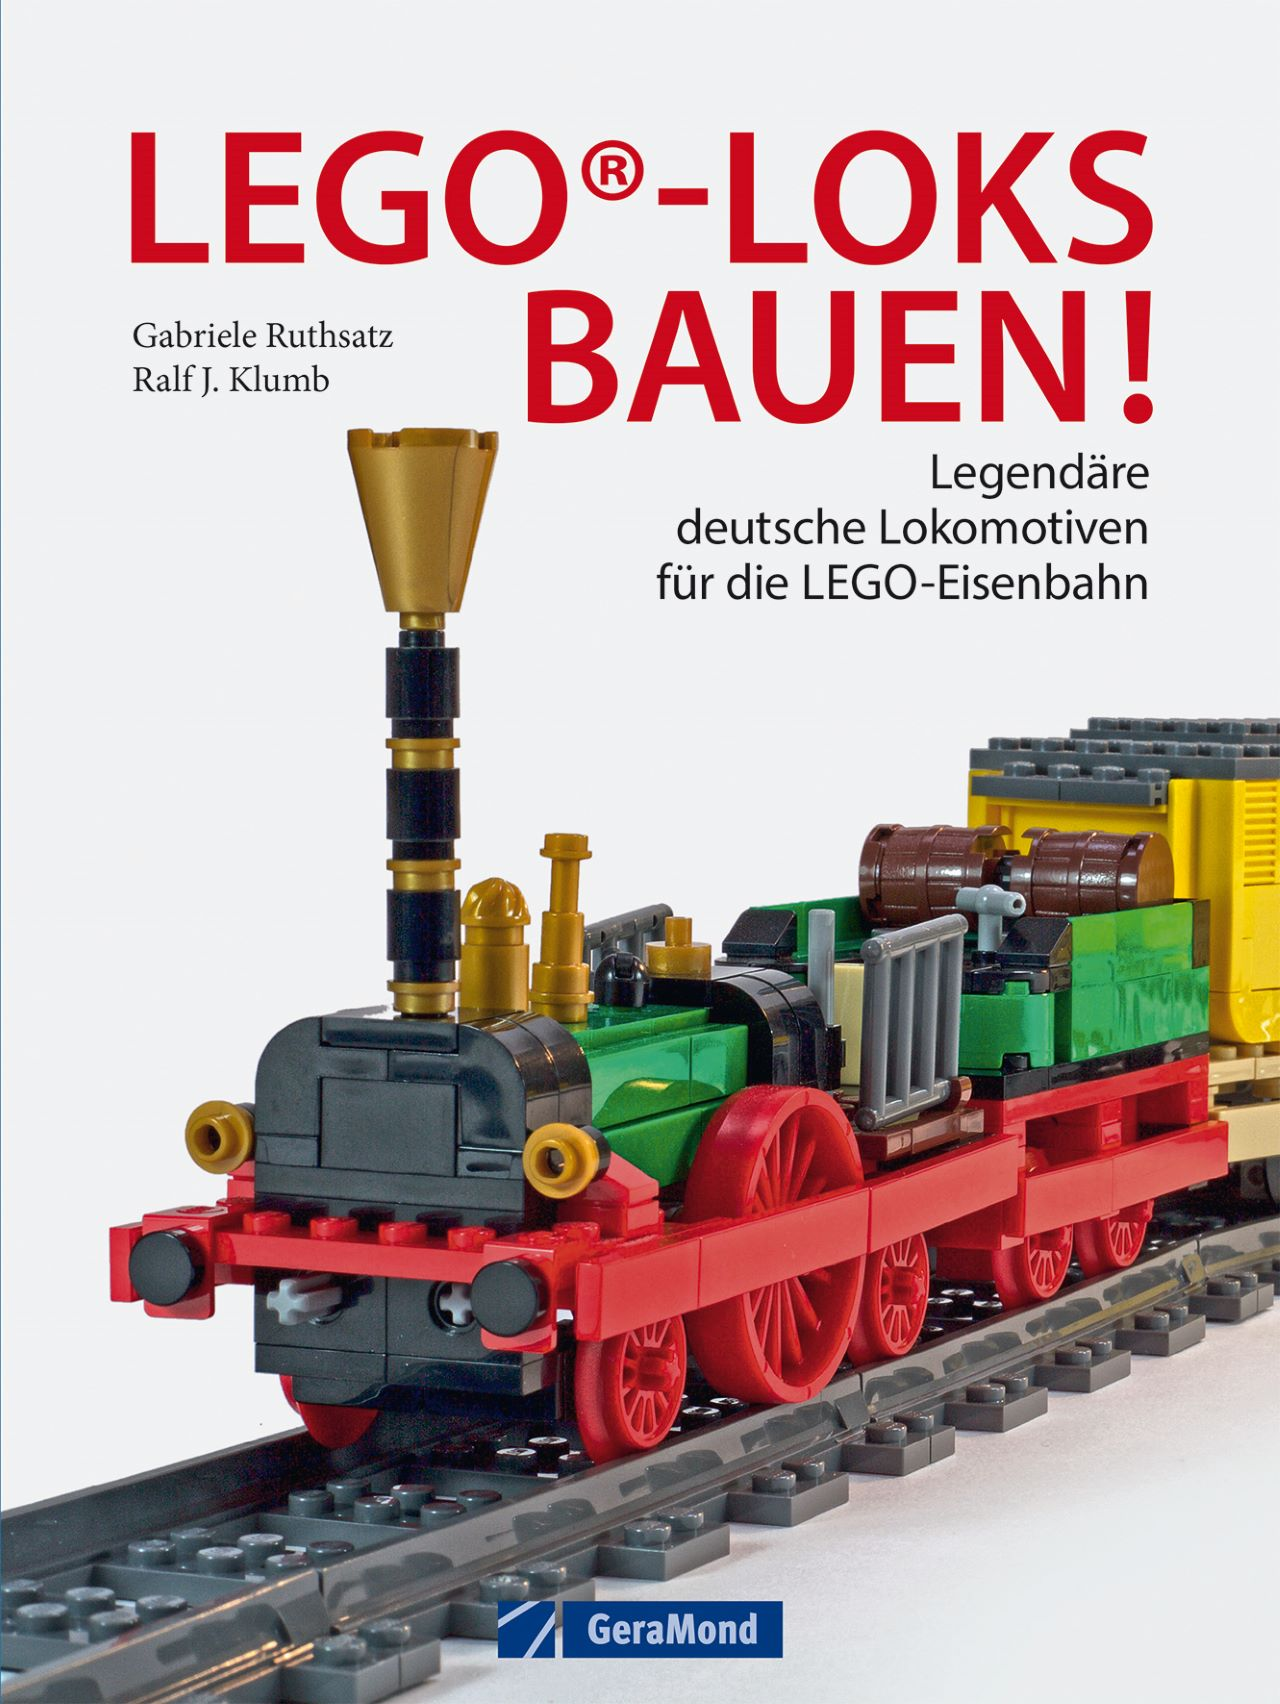 LEGO®-Loks bauen! thumbnail